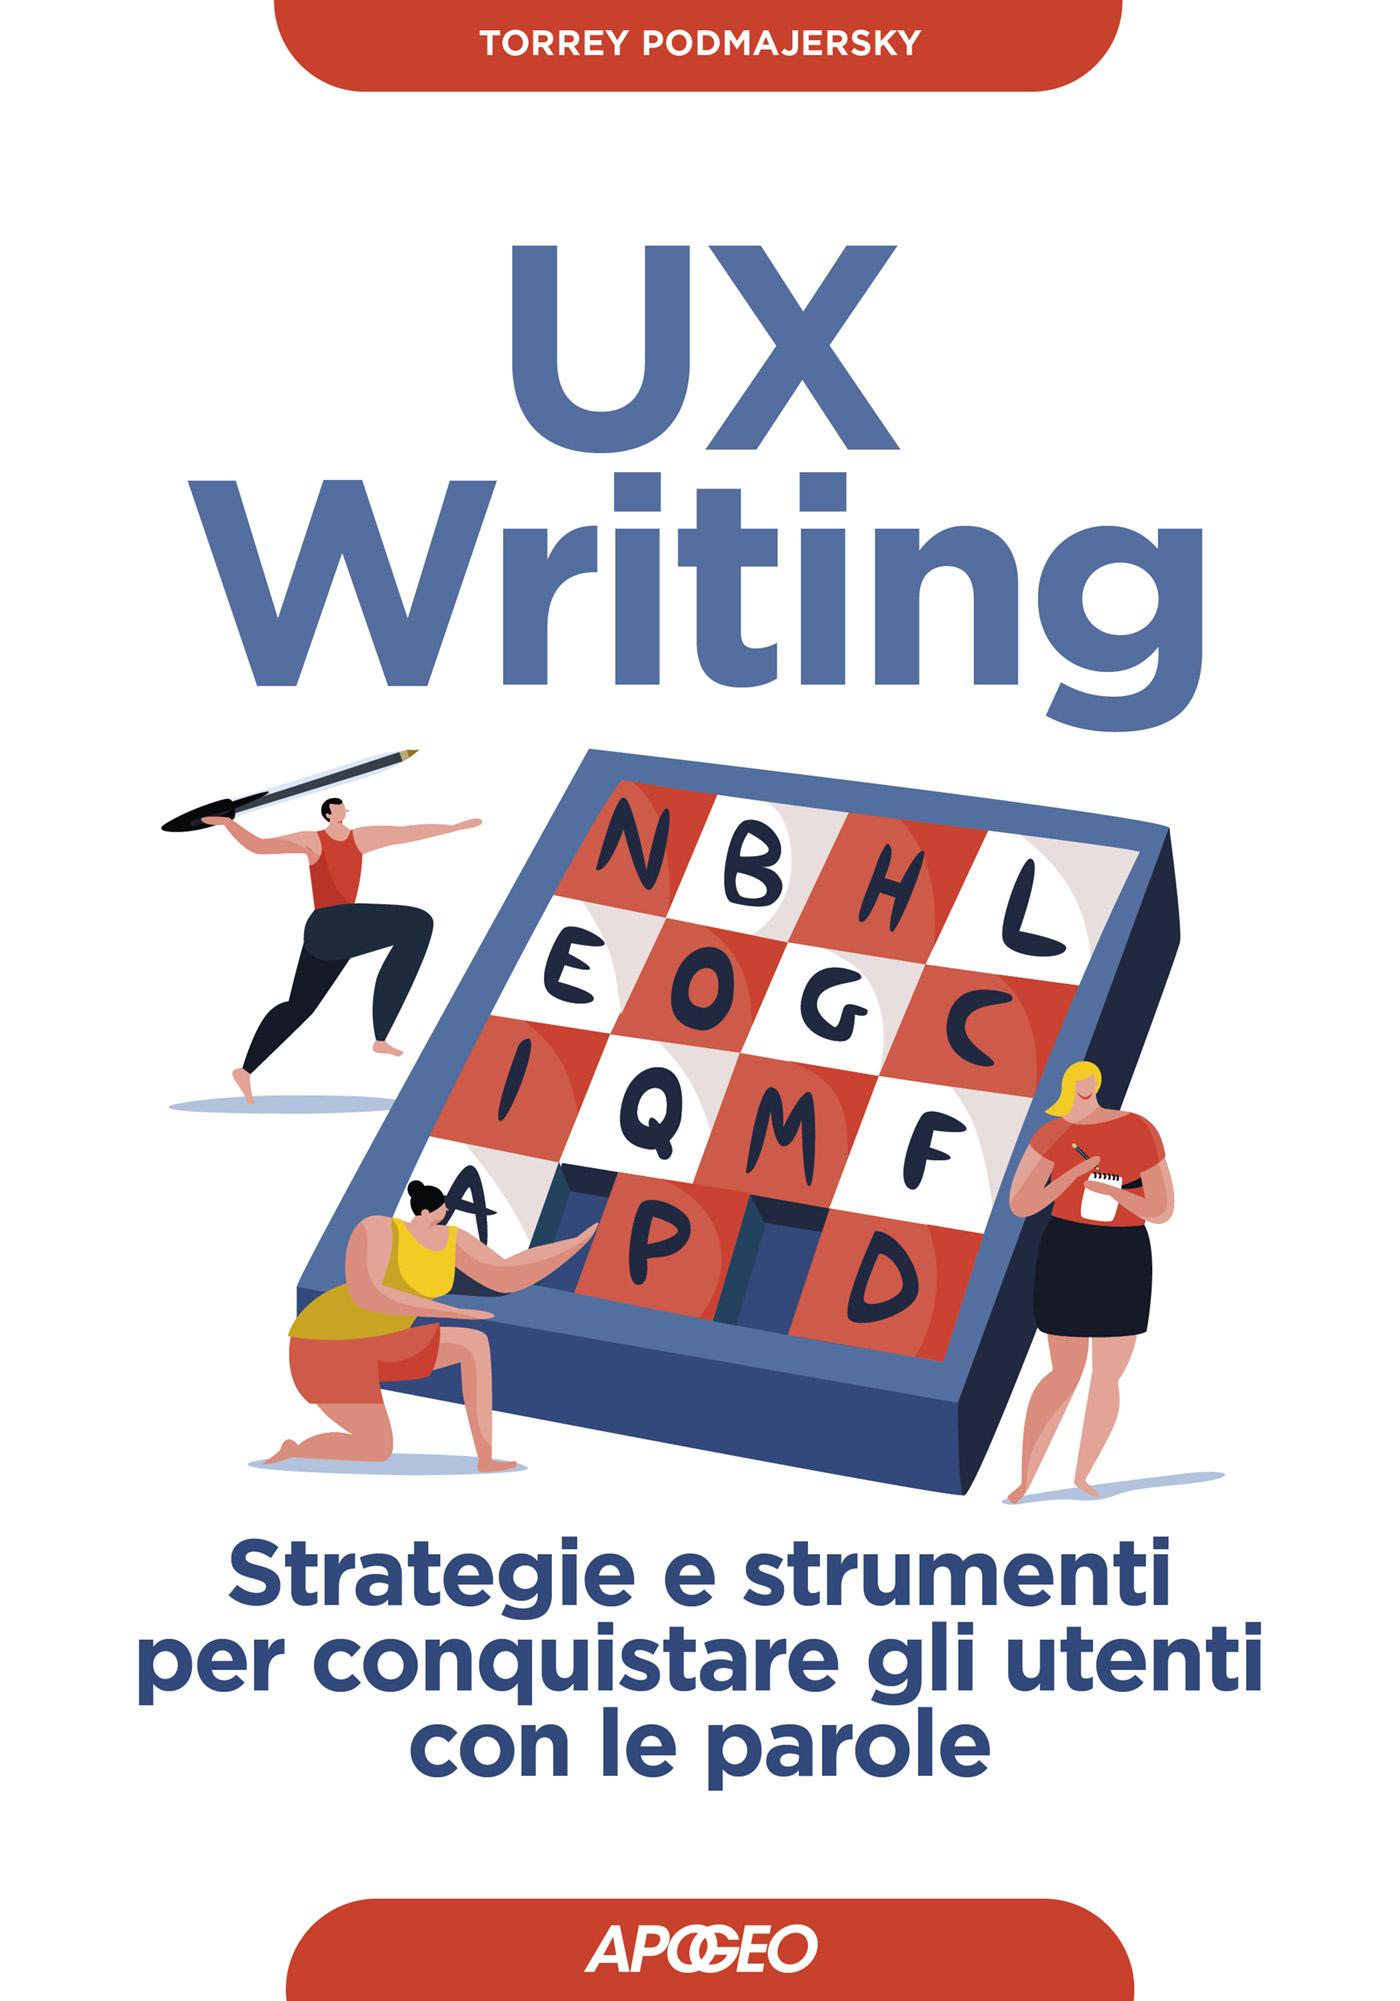 UX Writing, di Torrey Podmajersky